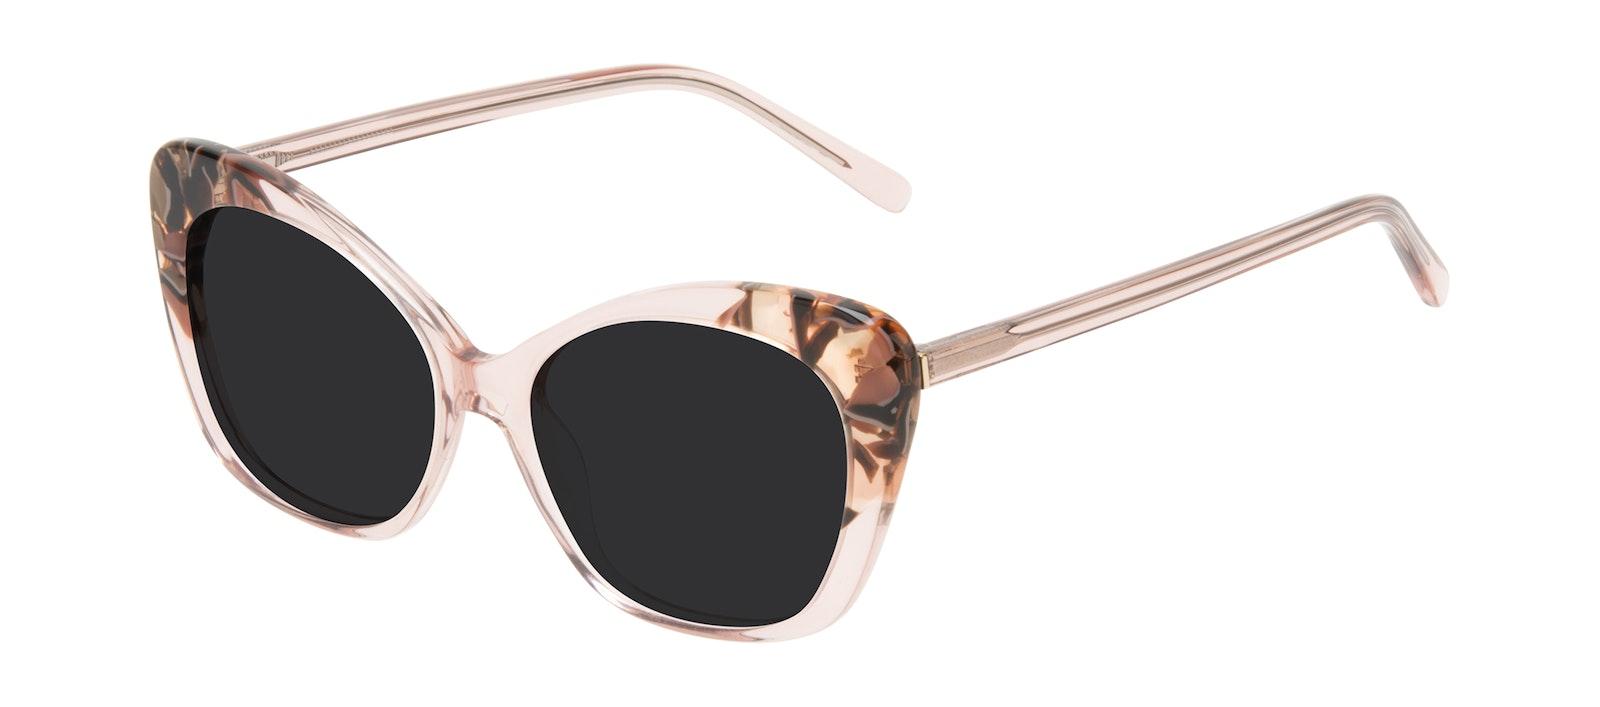 Affordable Fashion Glasses Cat Eye Sunglasses Women Obvious Pink Quartz Tilt